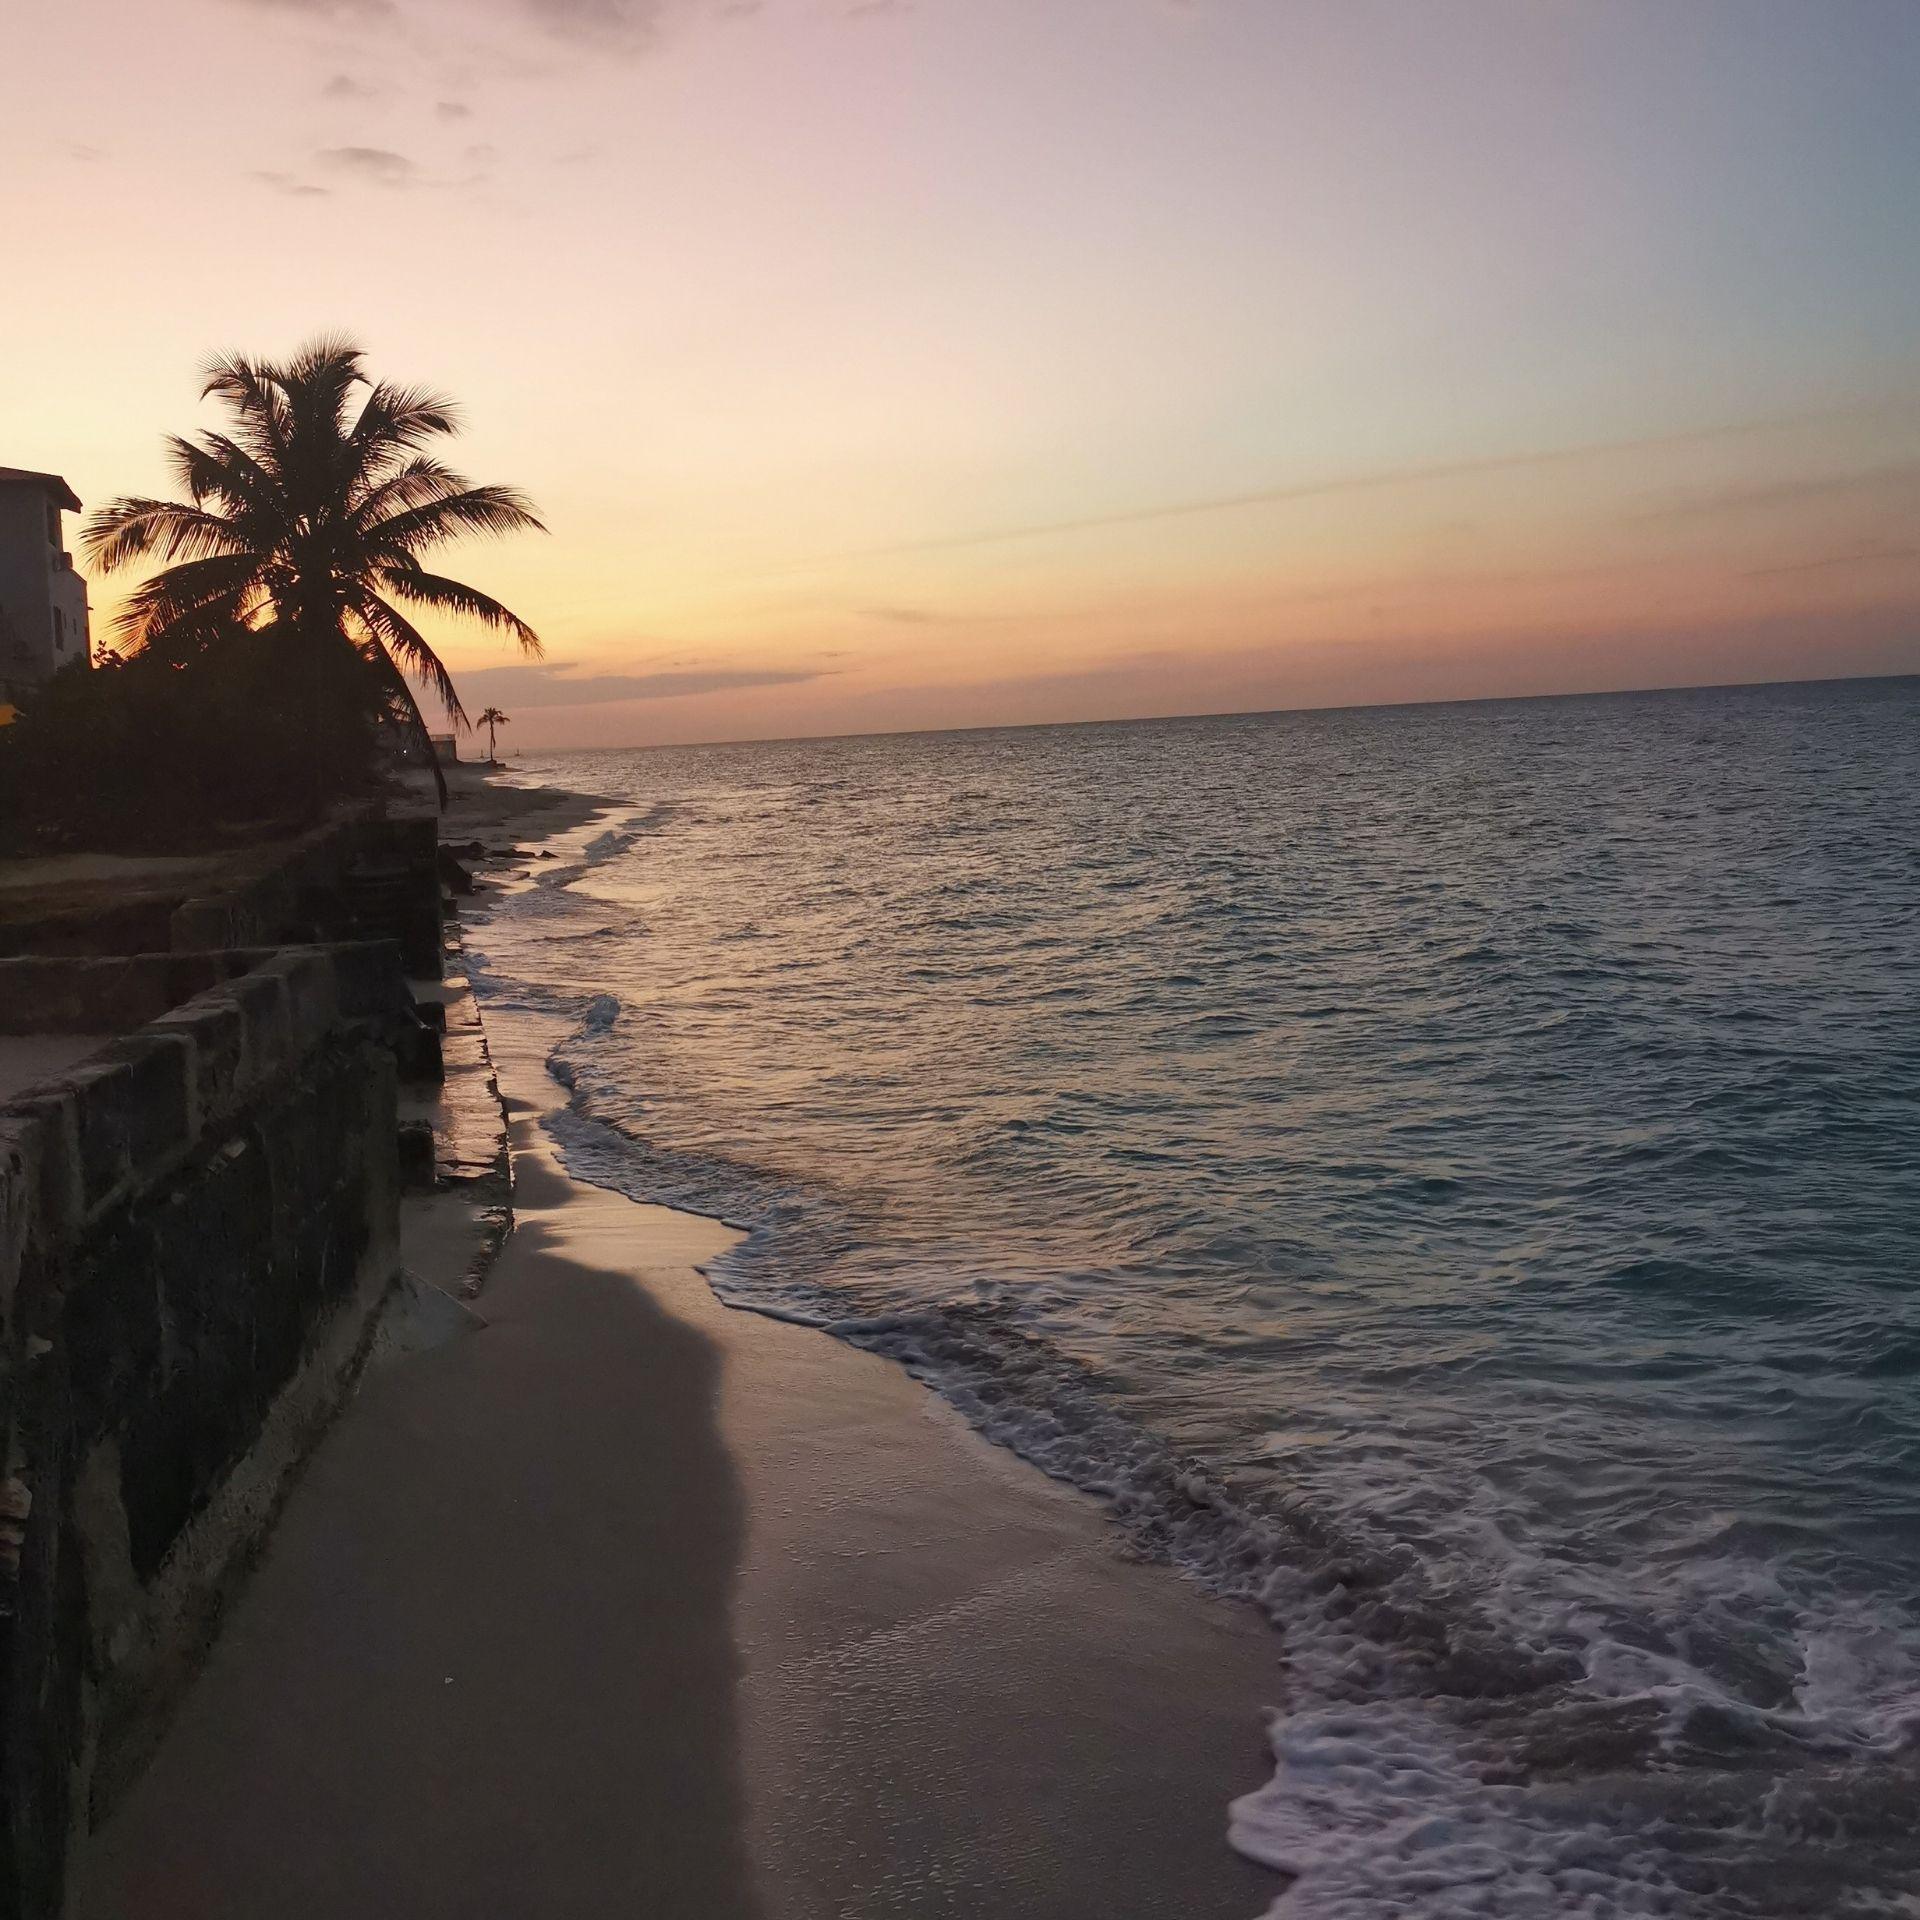 Beach at sunset in Cuba